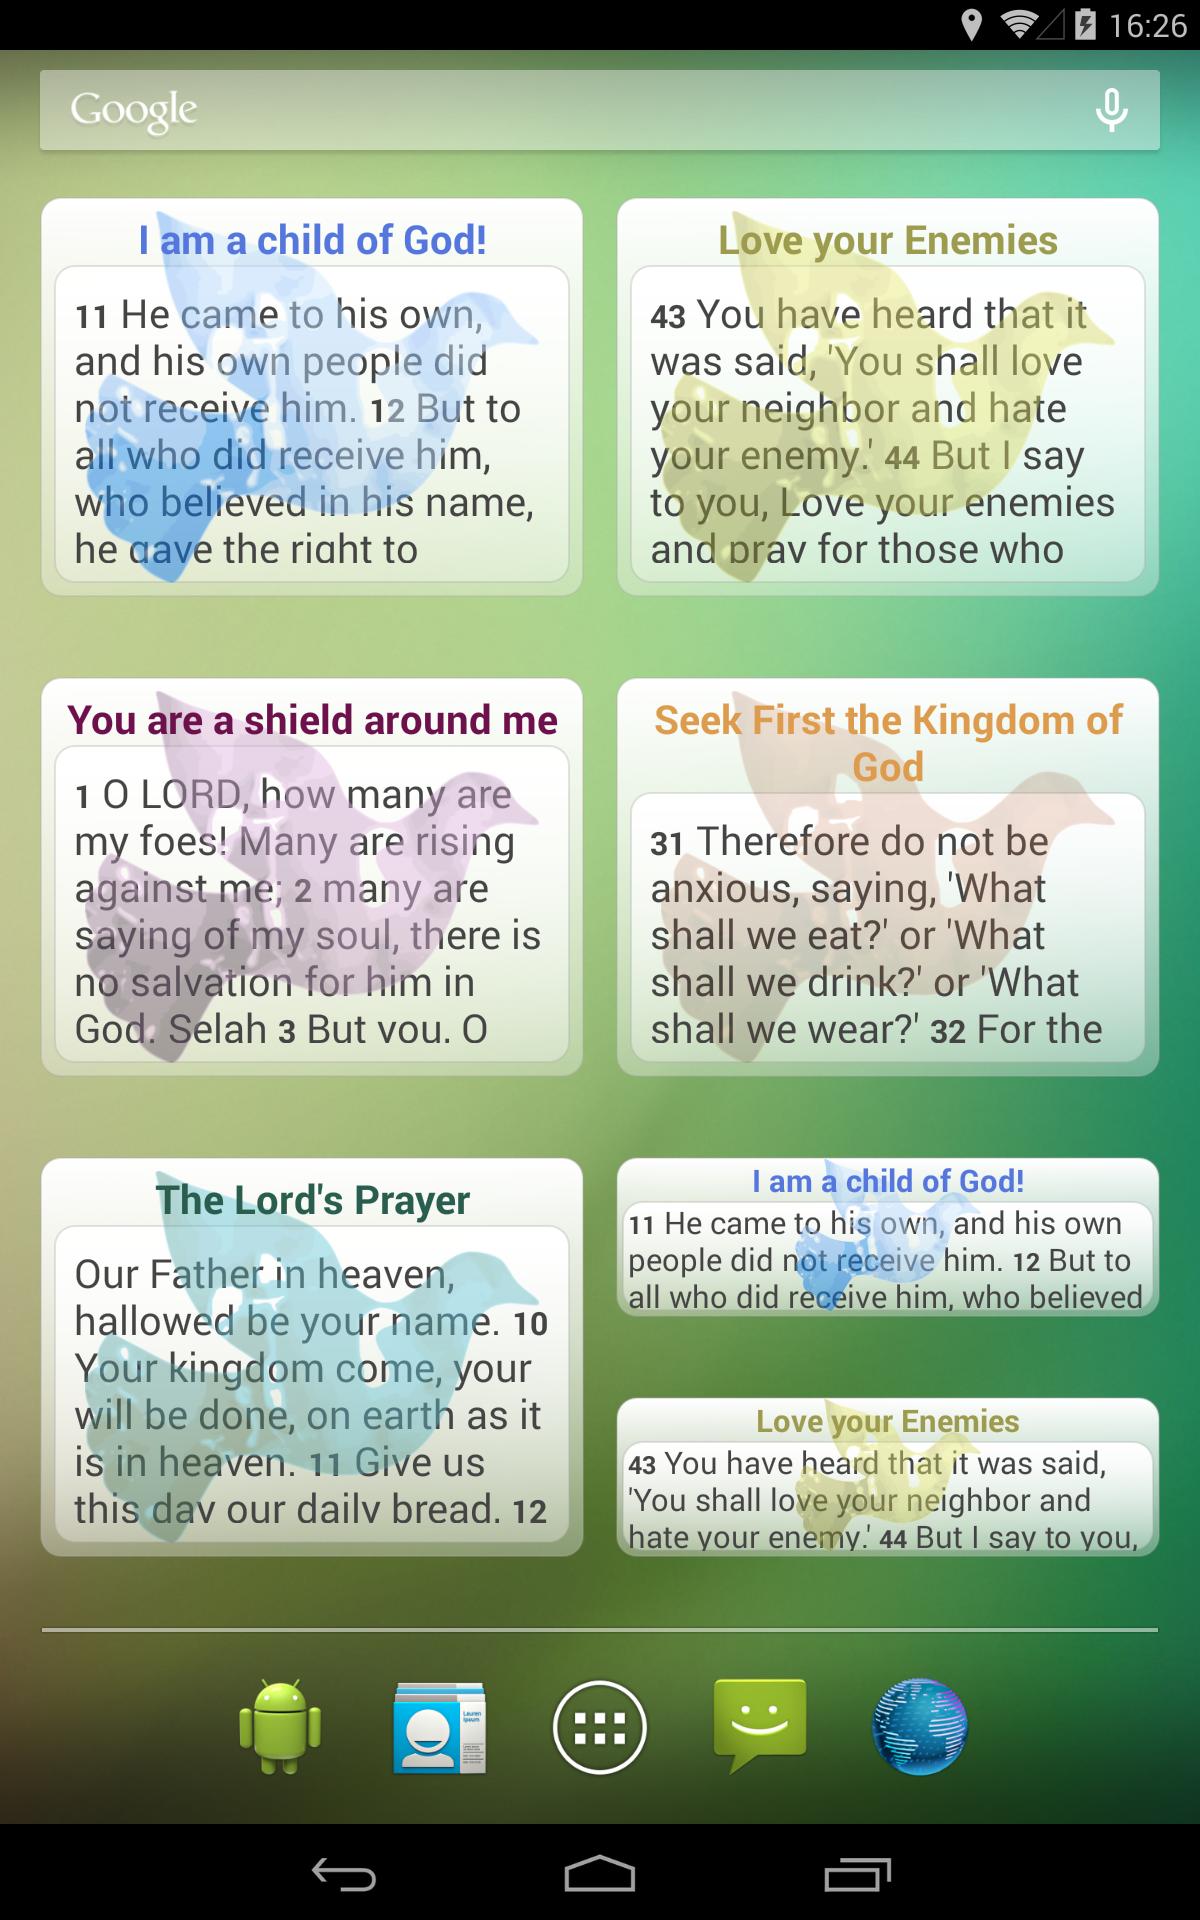 Inspiring Famous Quotes Daily screenshot #16